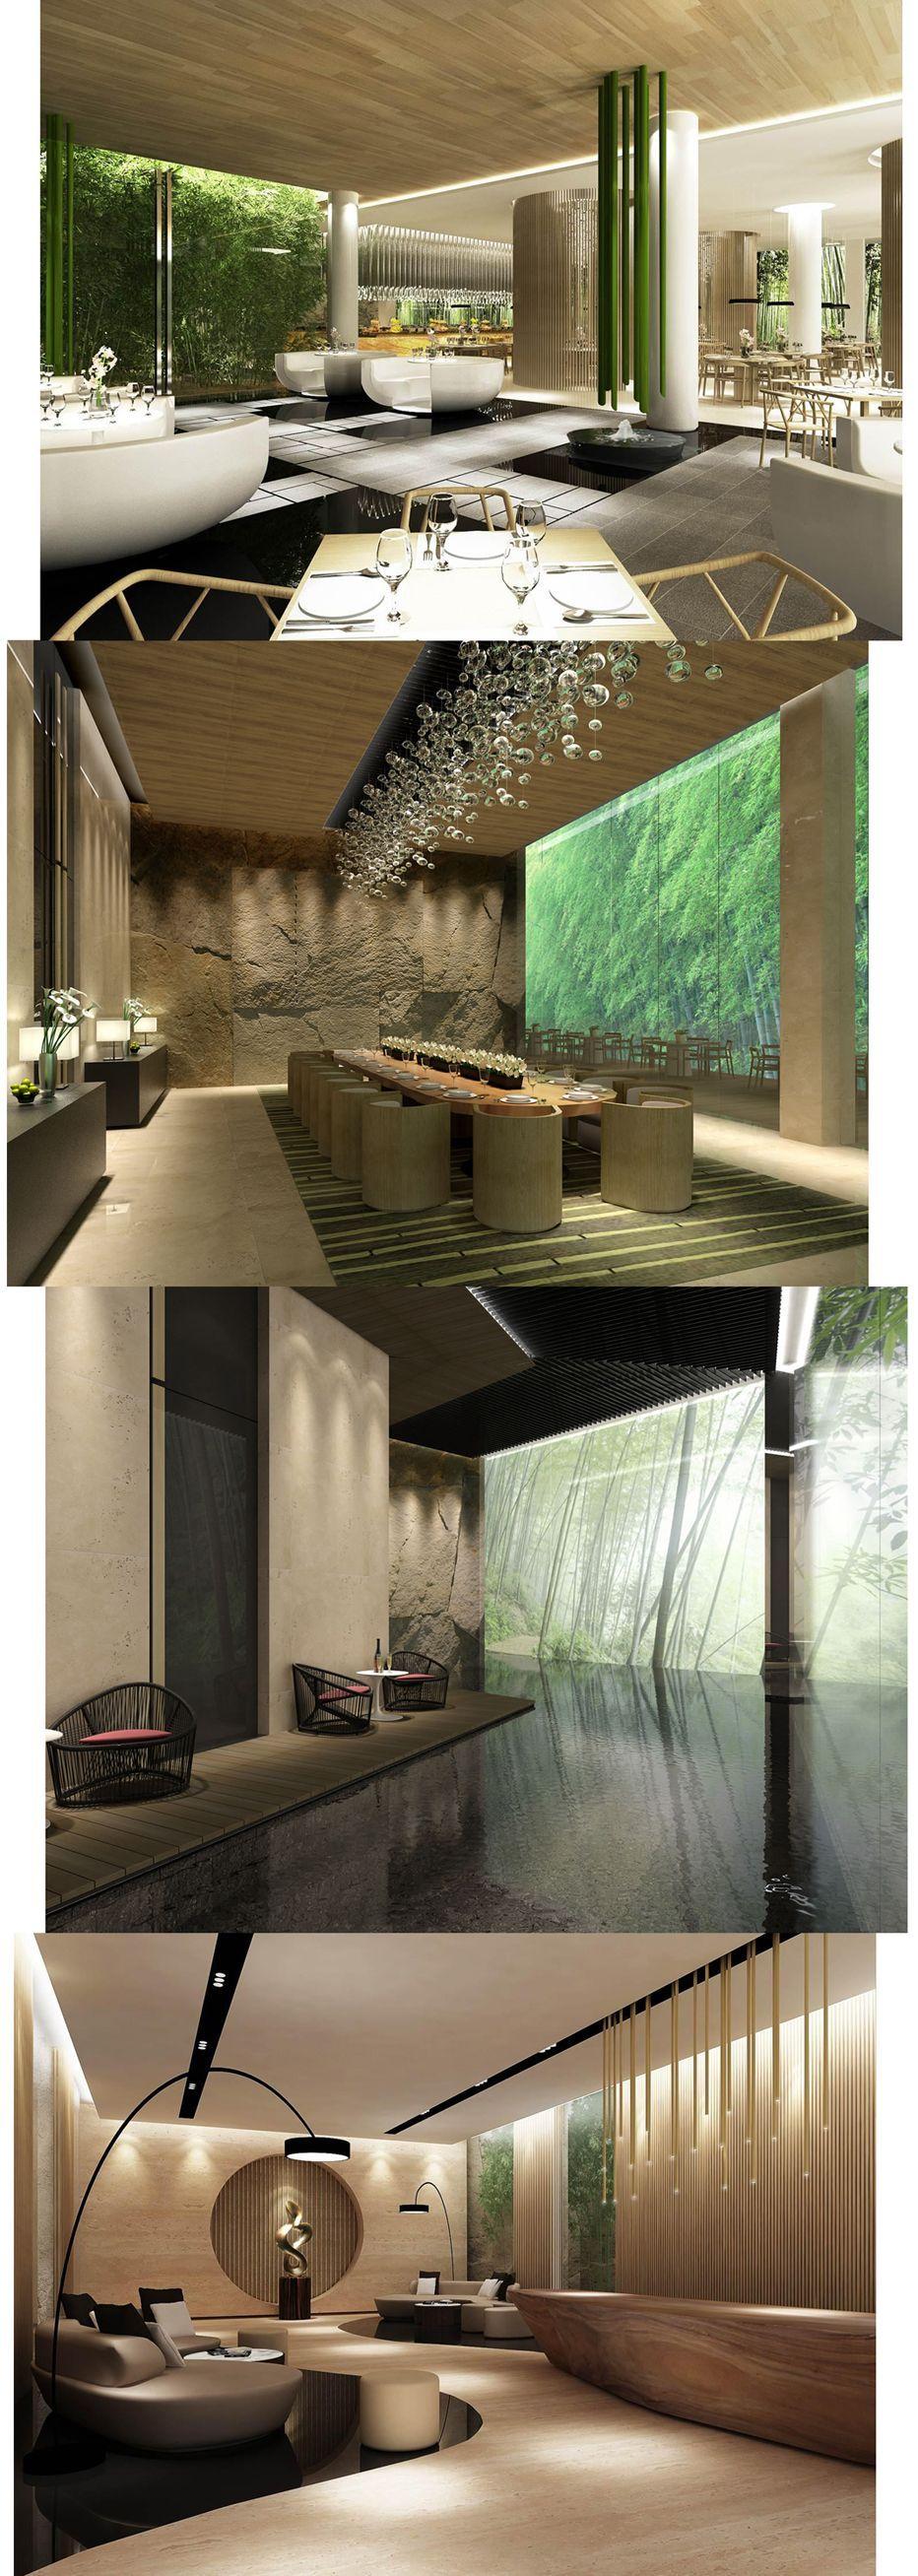 Pin by yen wang on lobby innenarchitektur architektur for Raumgestaltung architektur